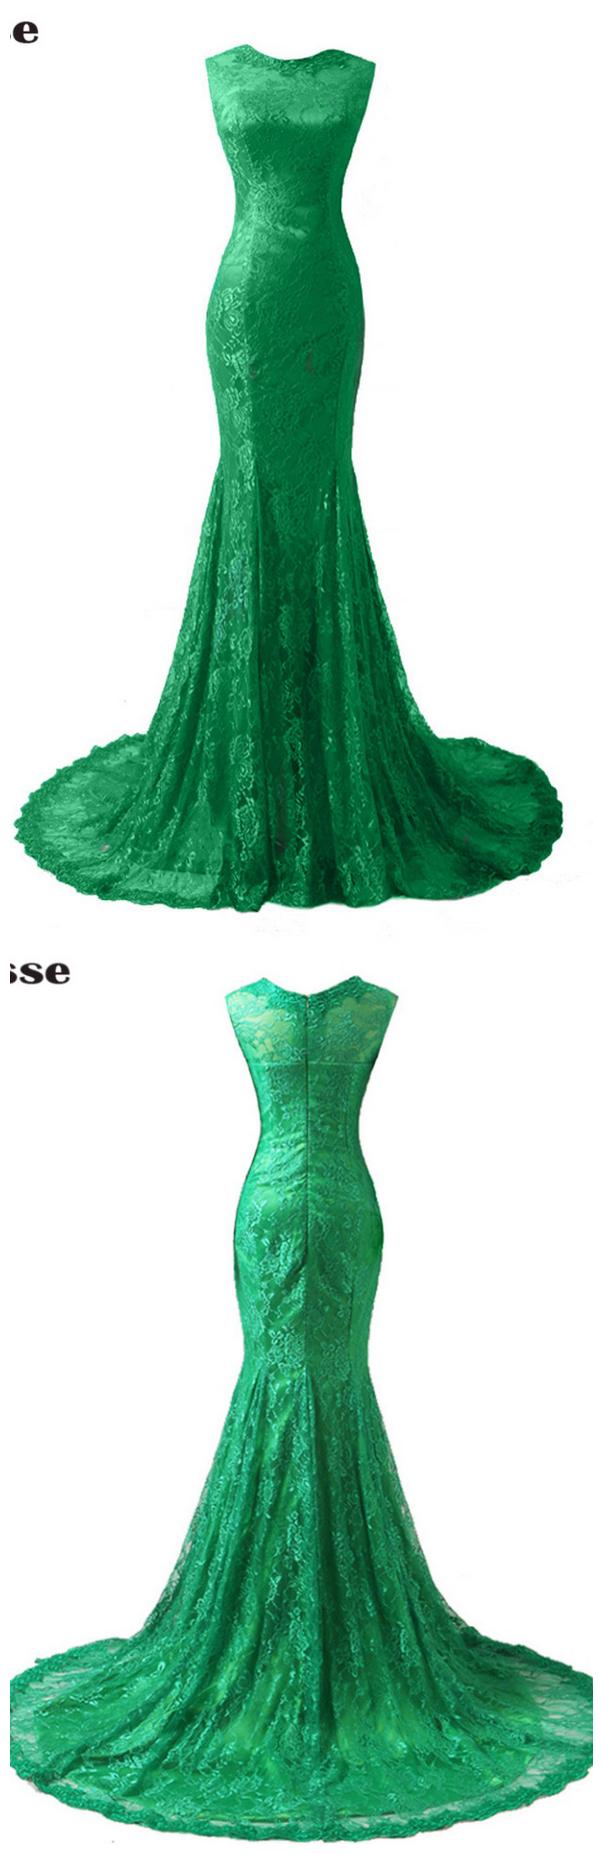 Lace appliques mermaid long evening dresses vestido de festa long